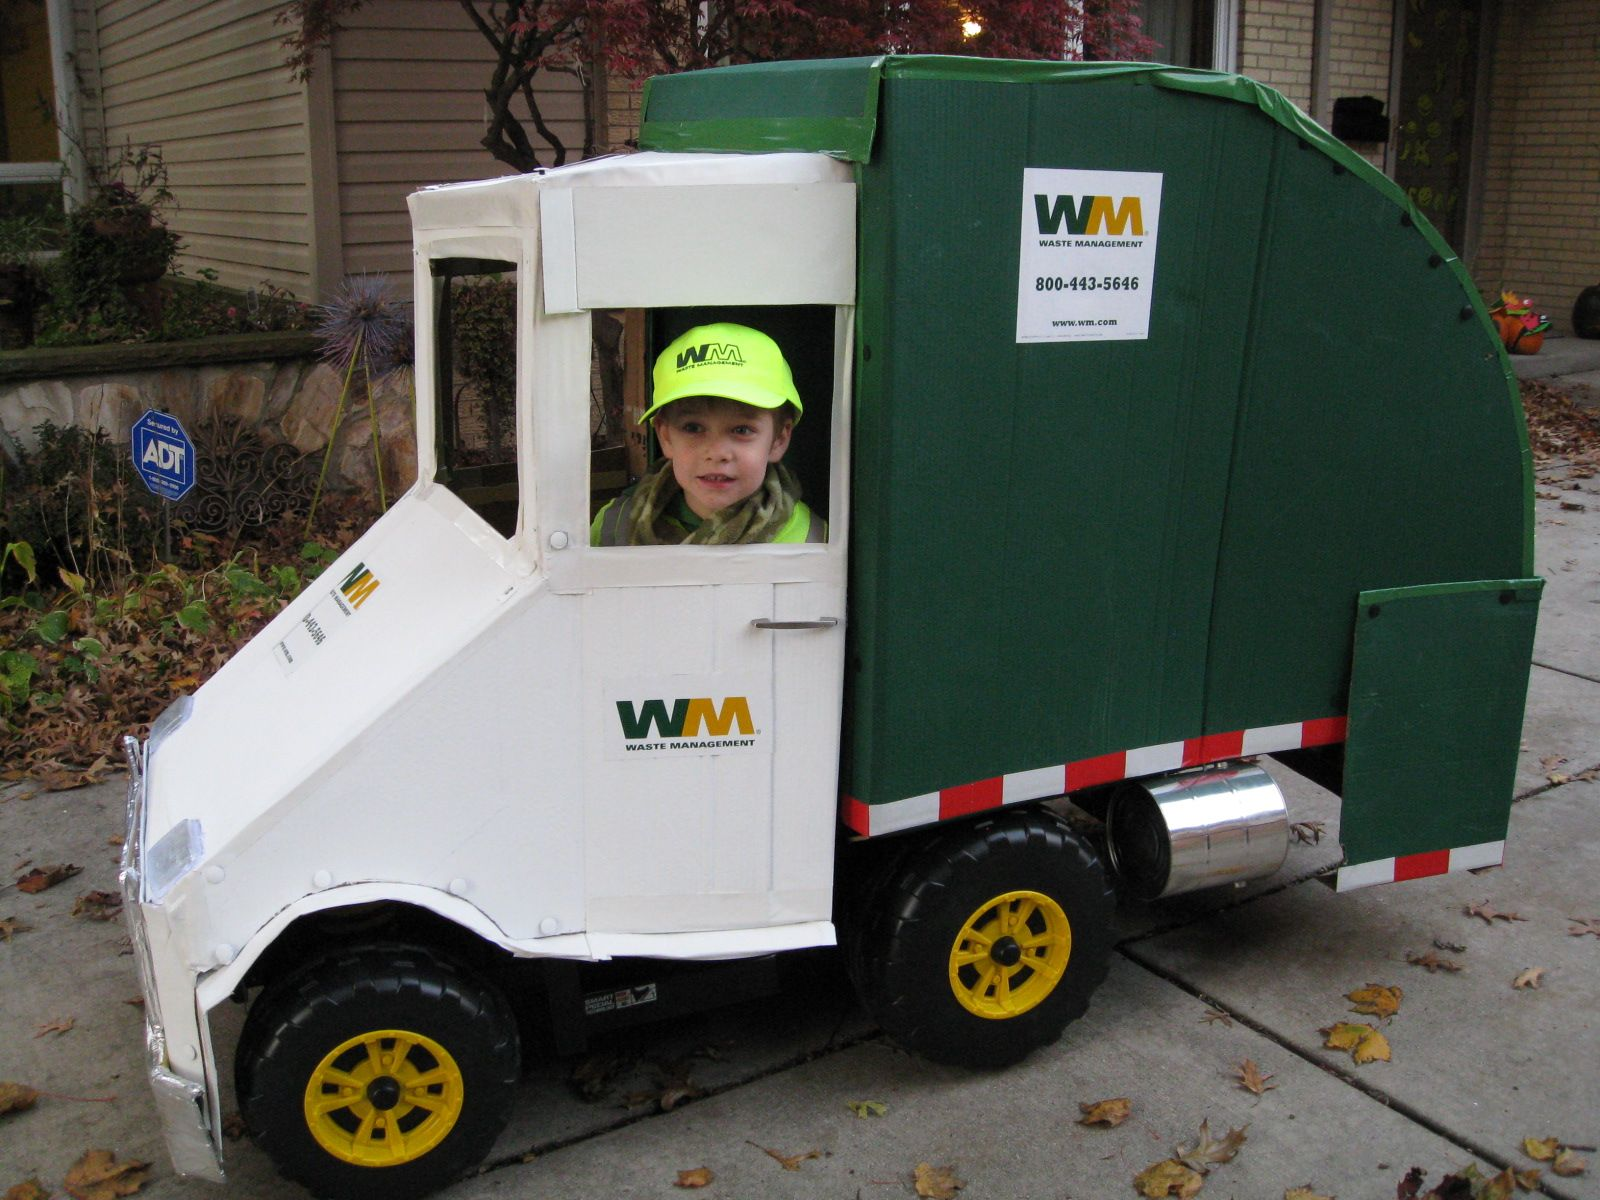 garbage truck halloween costume - Car Costumes For Halloween